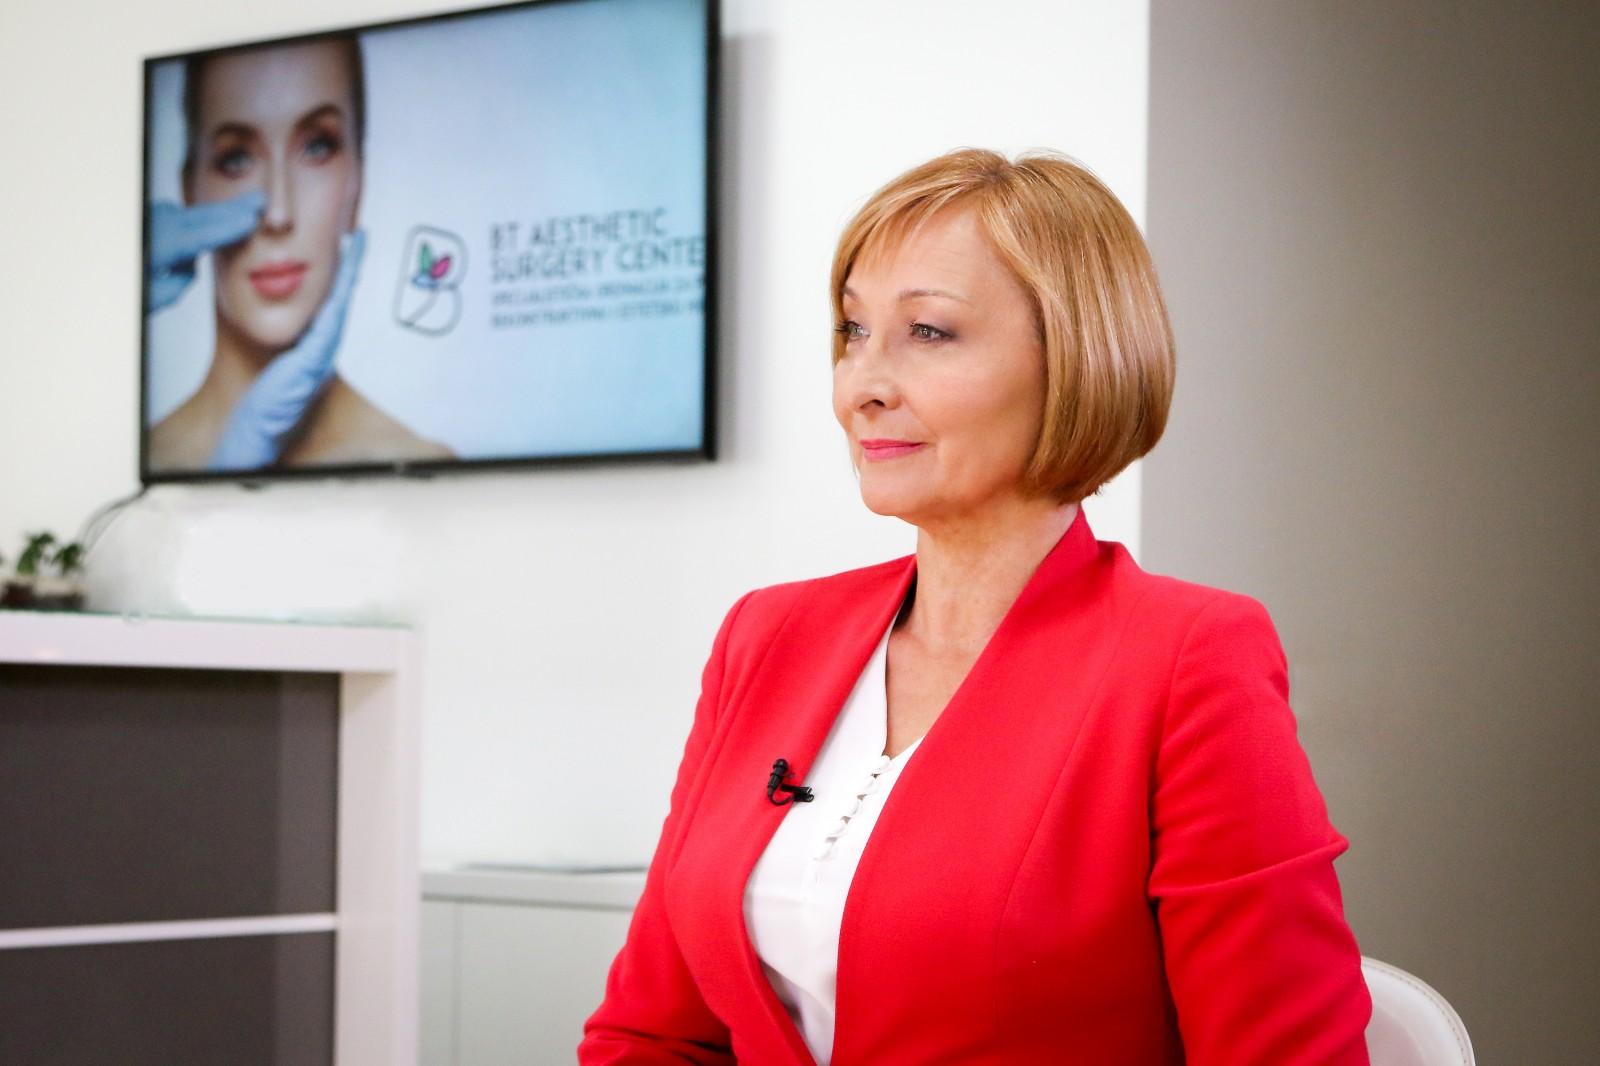 Vesna Radosavljević zaštitno lice BT Aesthtetic Surgery Centra